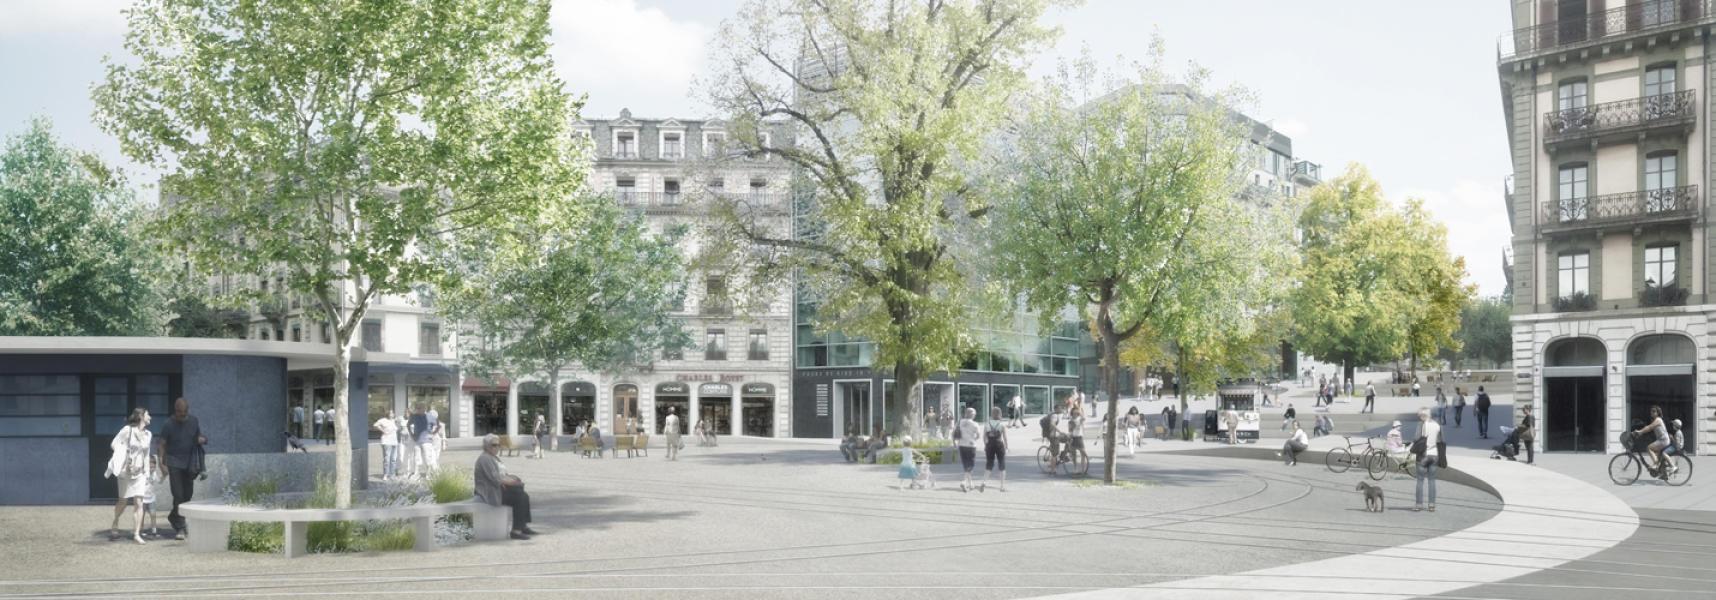 Projet CONTINUUM, Pascal Heyraud Sàrl – Architecte paysagiste, Neuchâtel